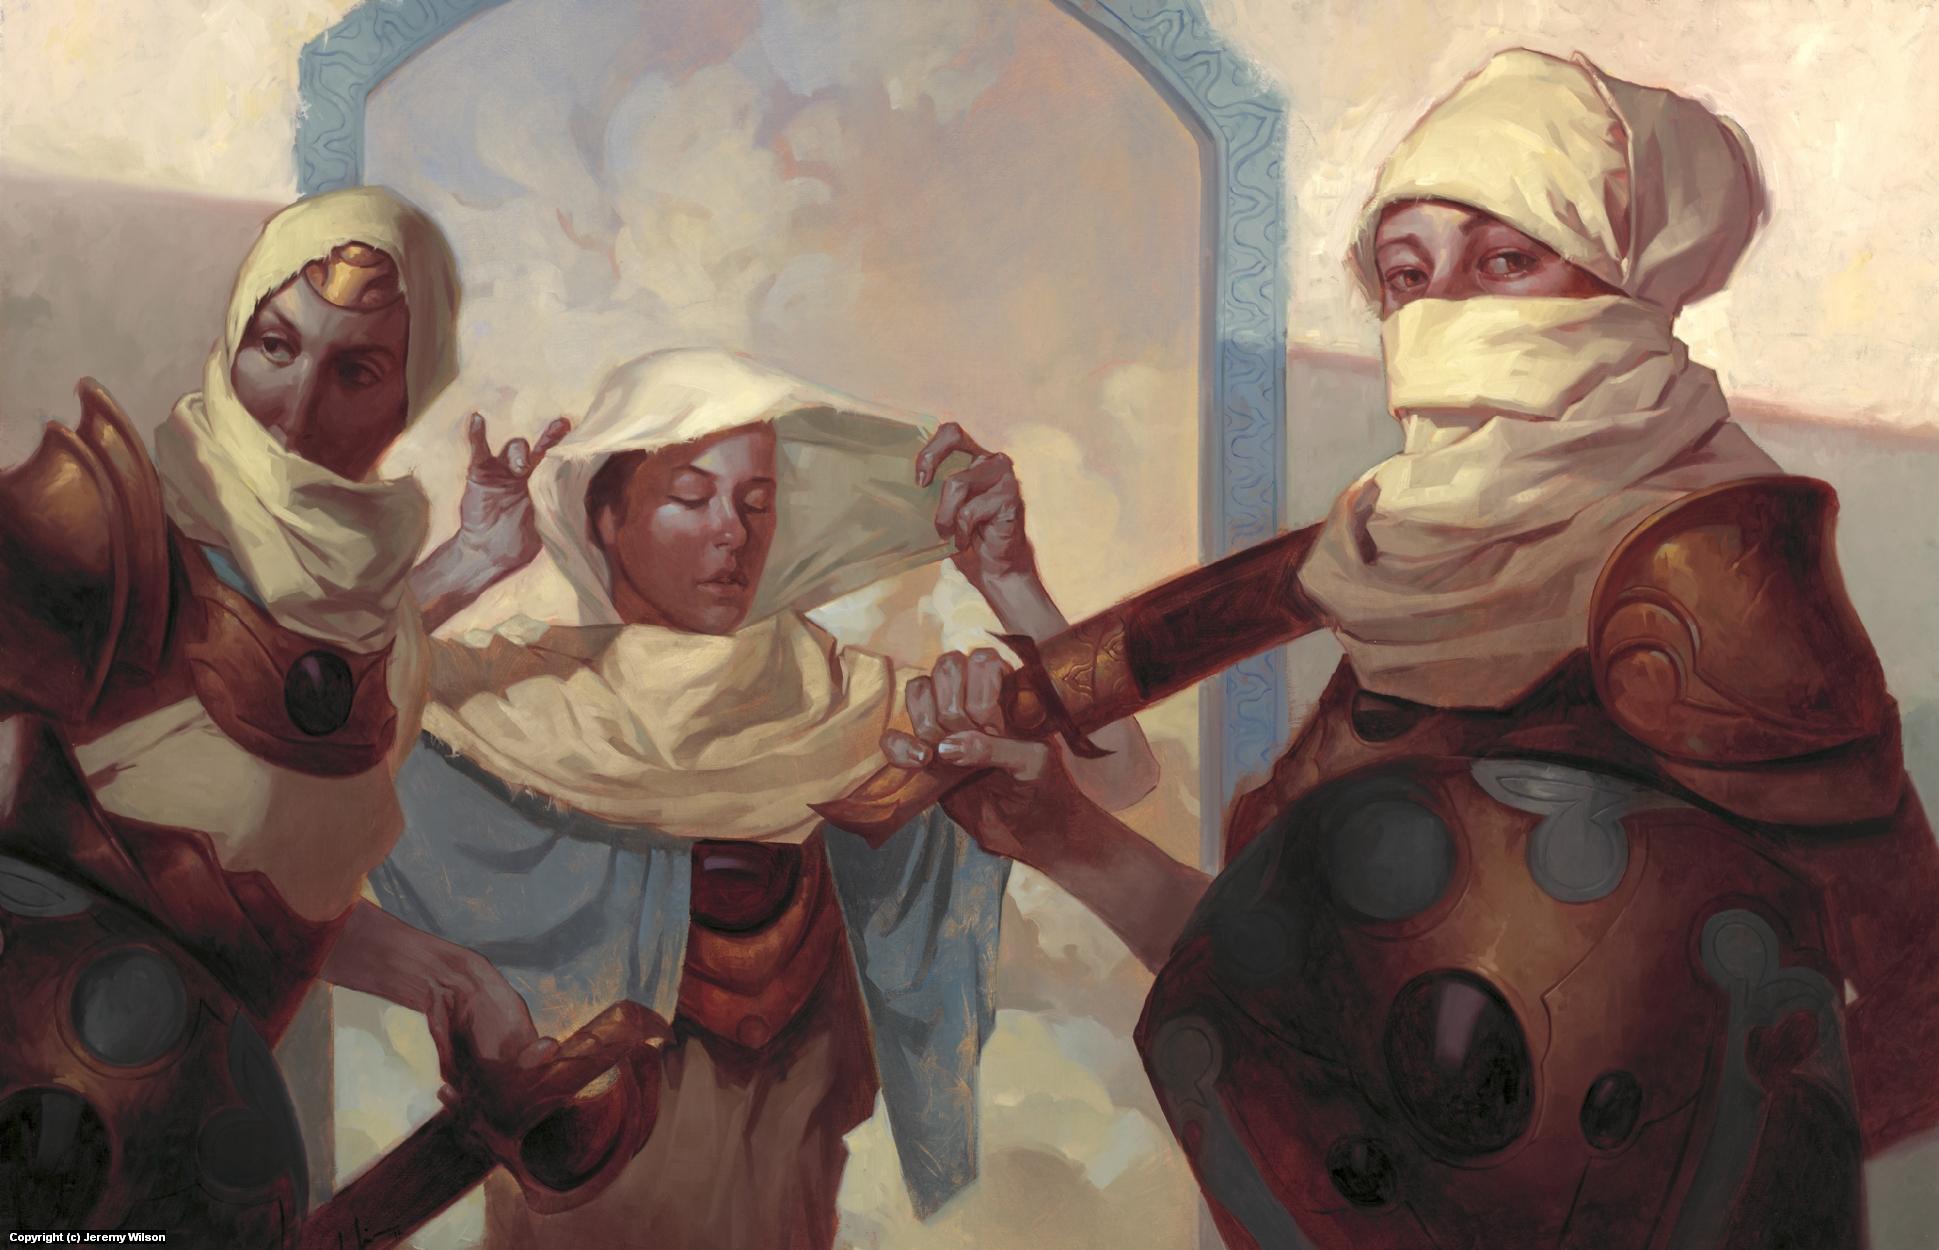 Desert Guardians Artwork by Jeremy Wilson